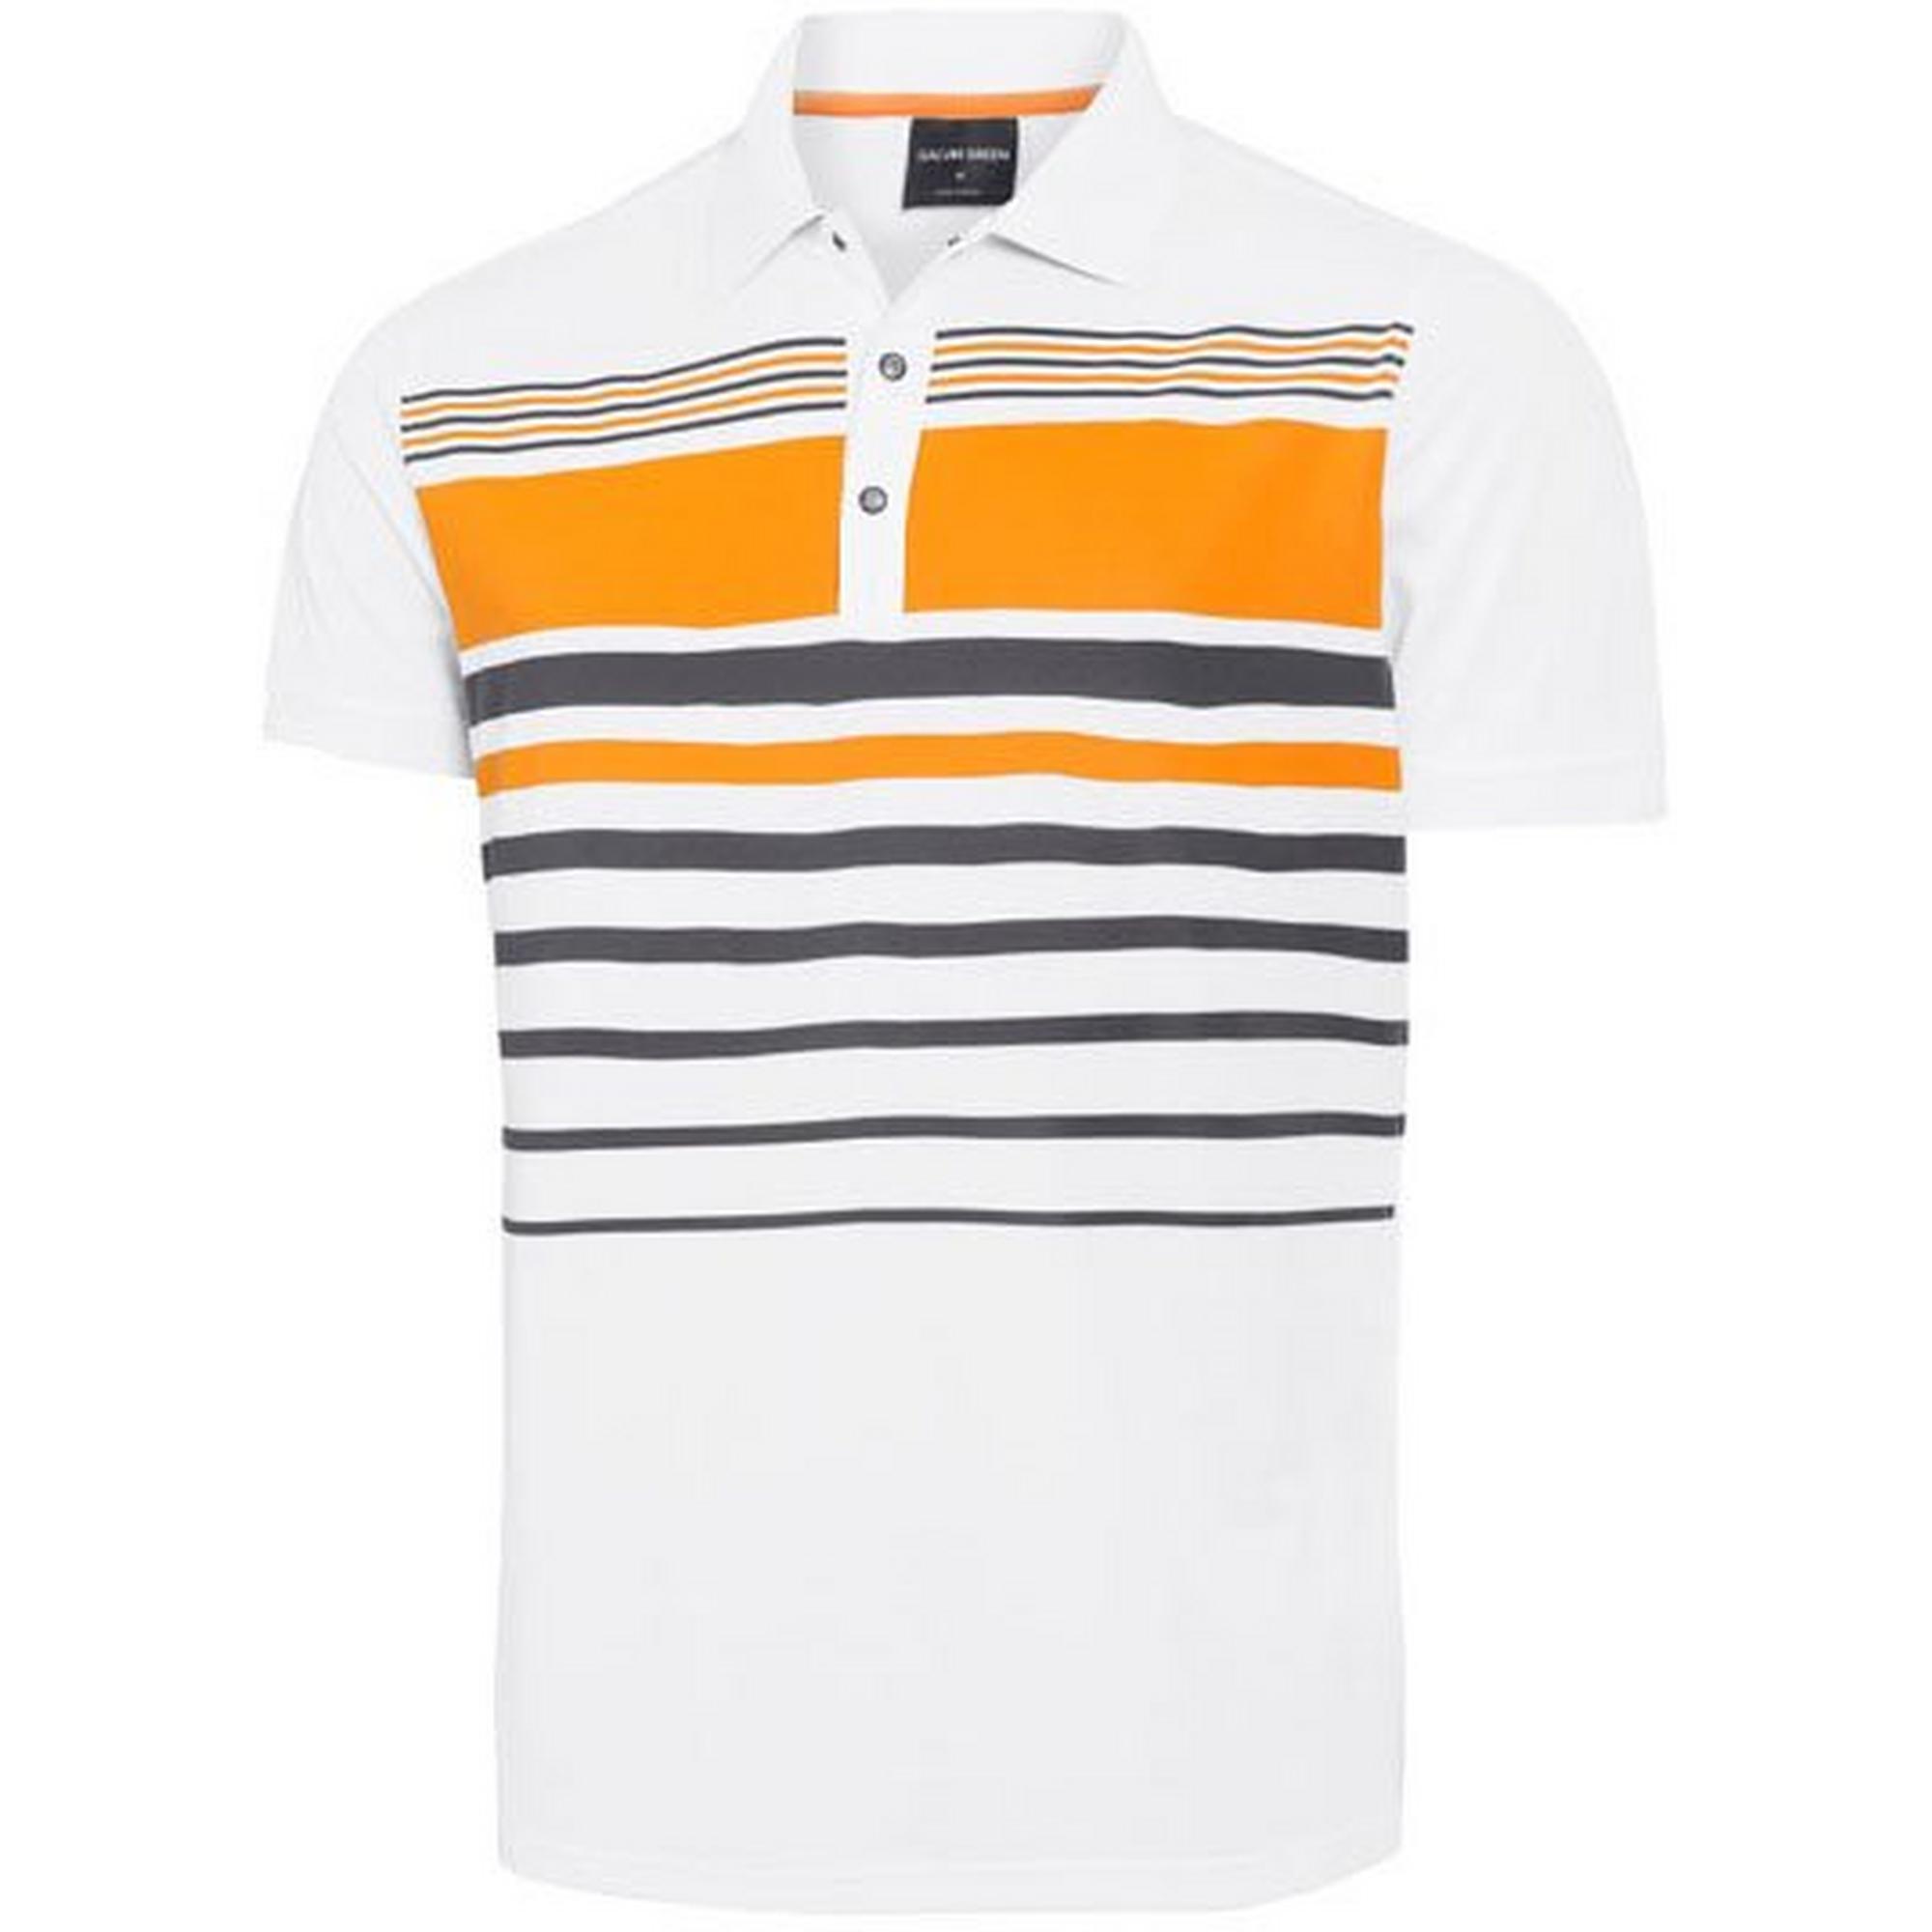 Men's Mayer VENTIL8 Short Sleeve Polo